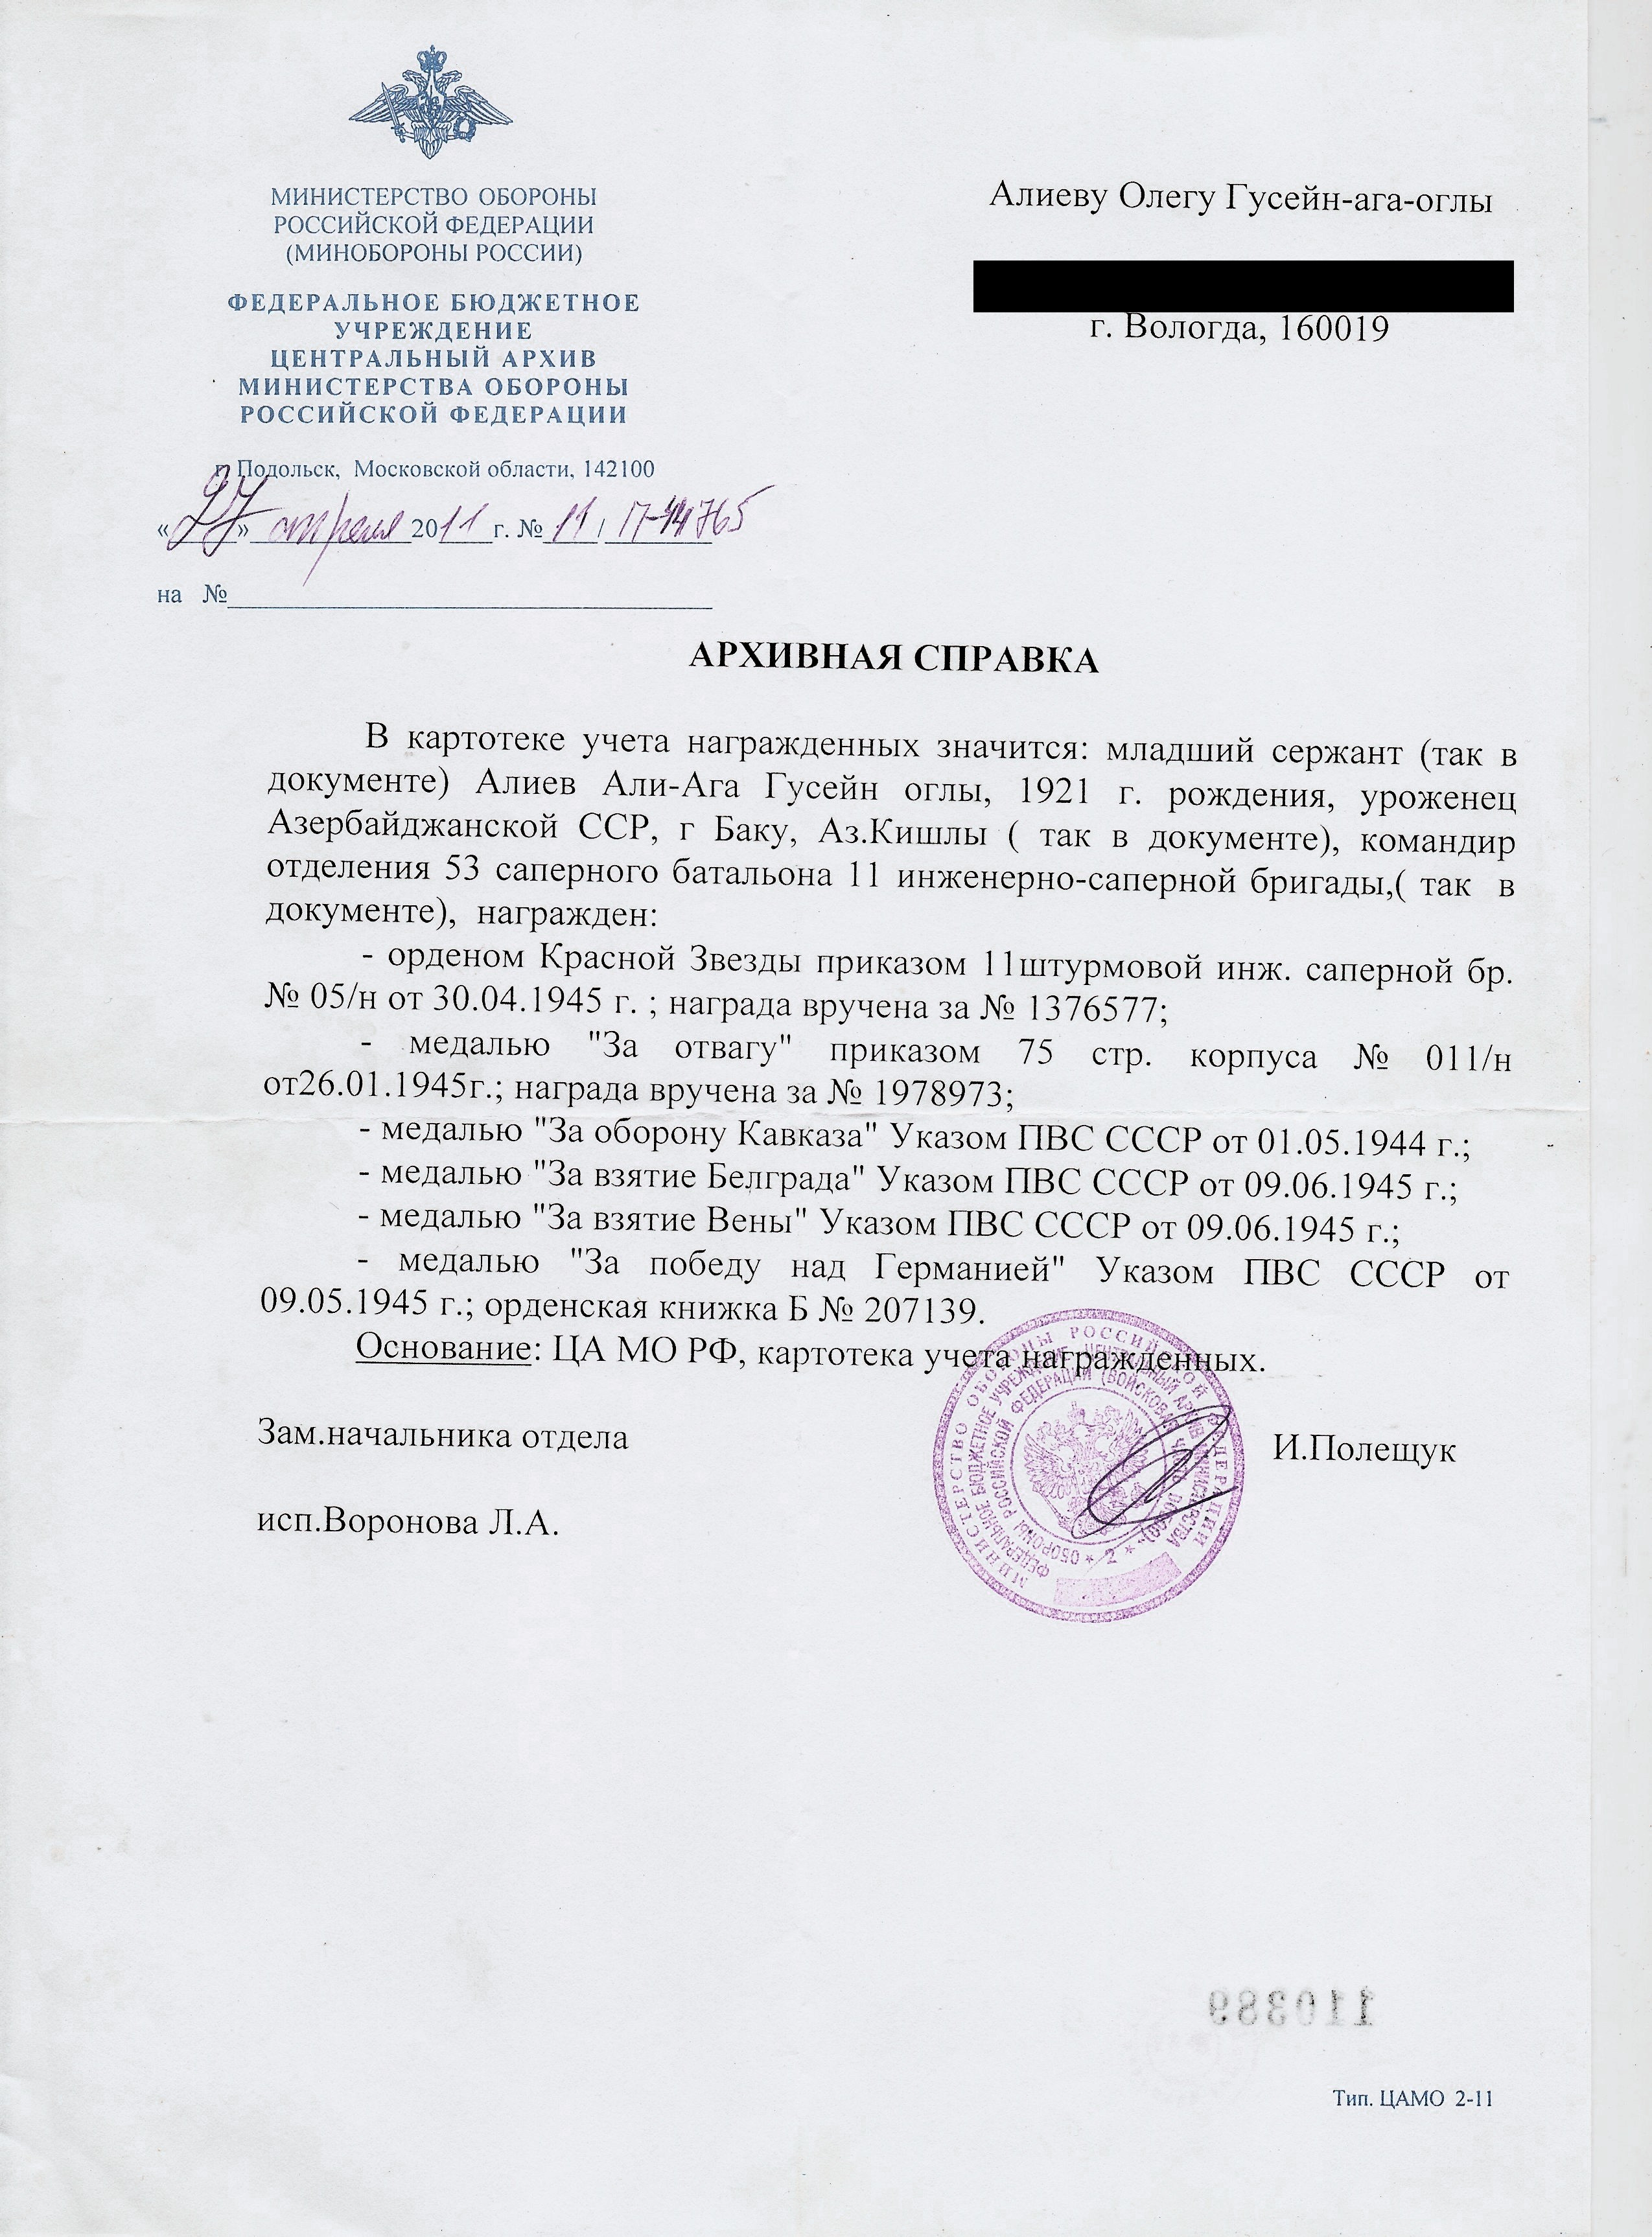 Pismo_MO_RF_po_Dedu_Ali-aga_Alievu